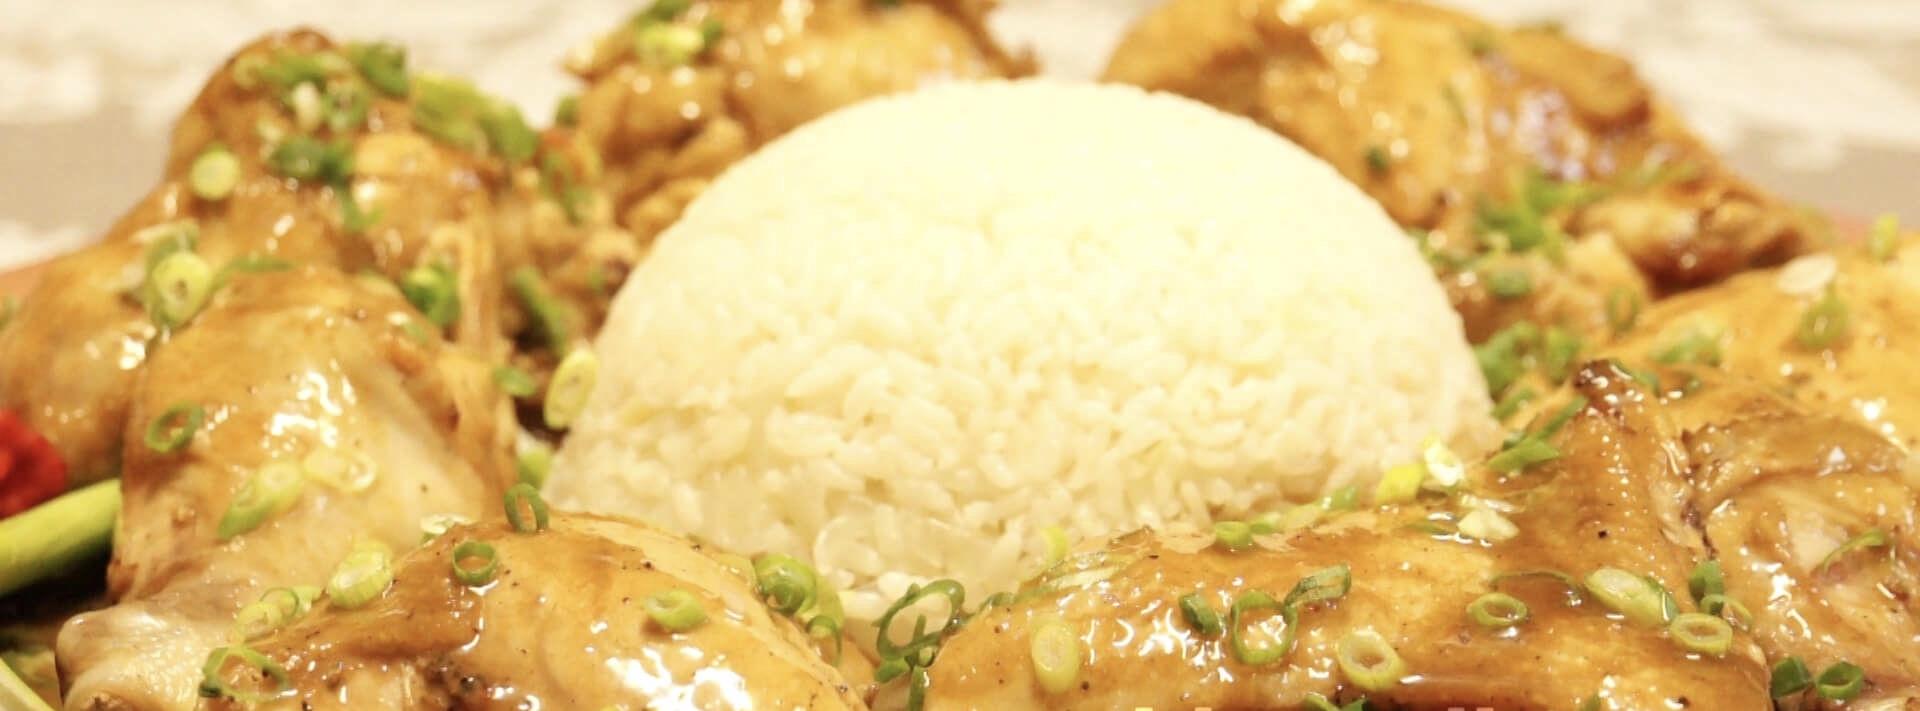 Адобо из курицы — рецепт с фото и видео